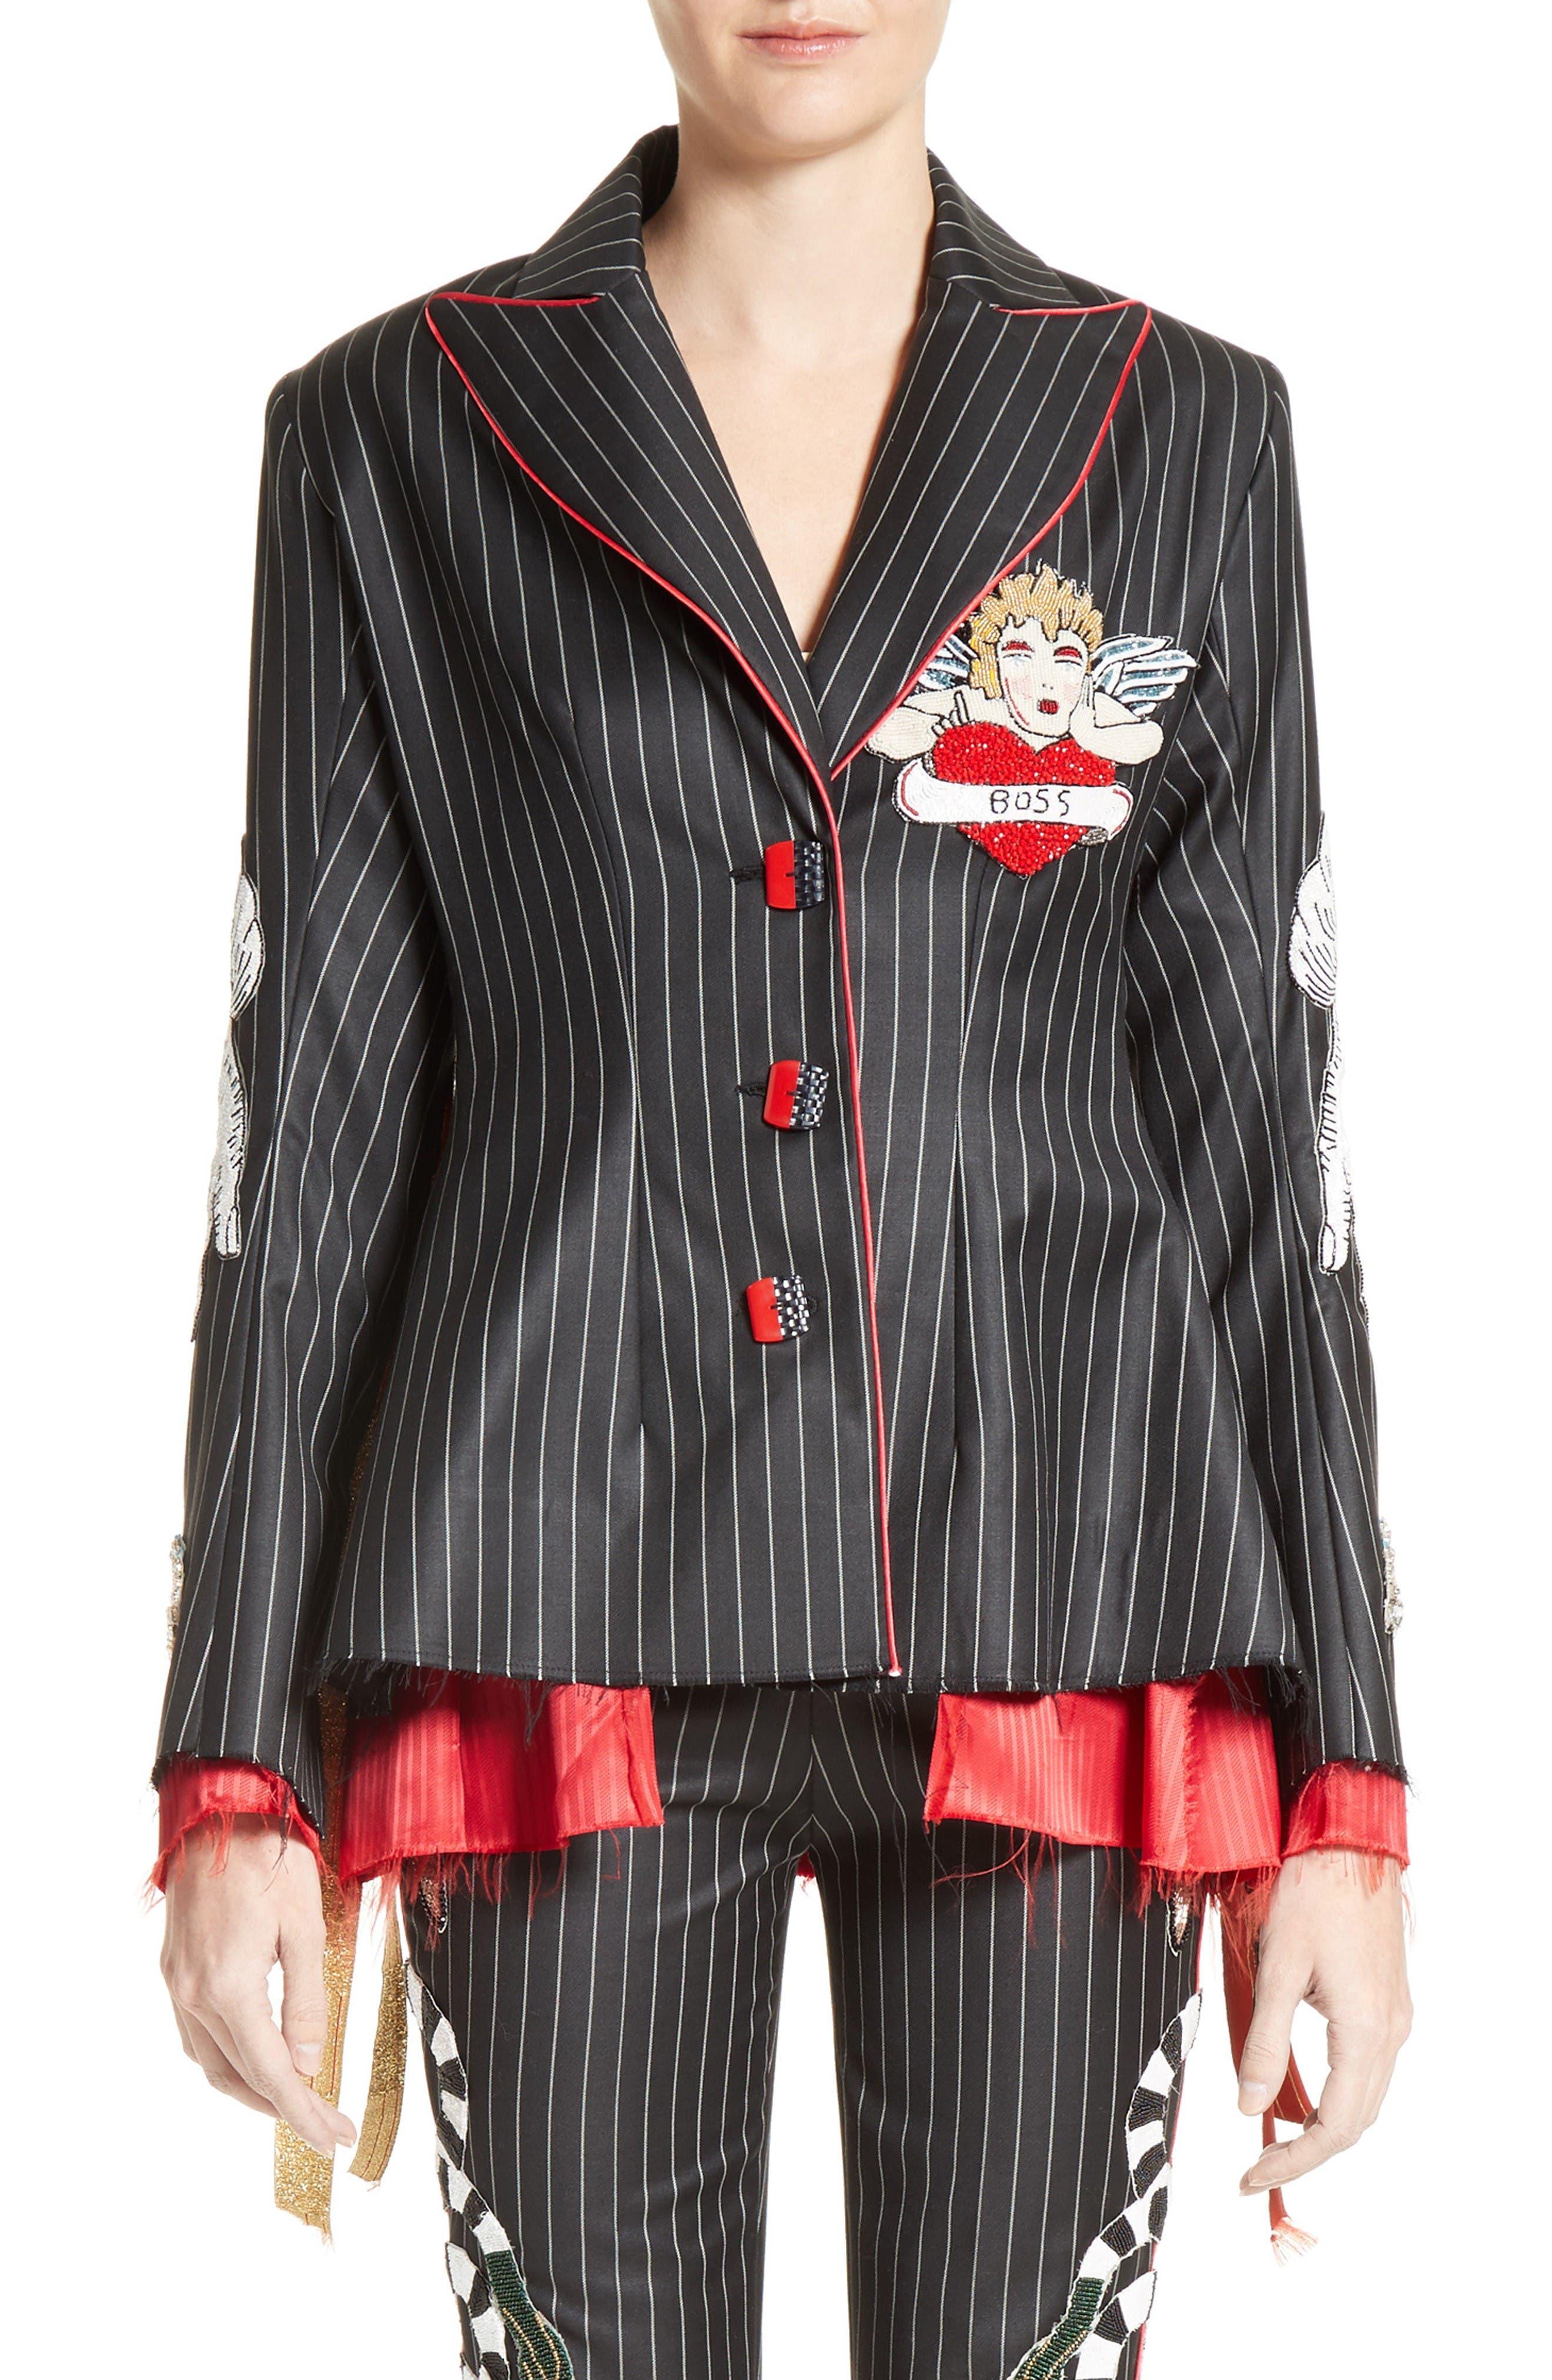 Alternate Image 1 Selected - Dilara Findikoglu Embellished Pinstripe Suit Jacket